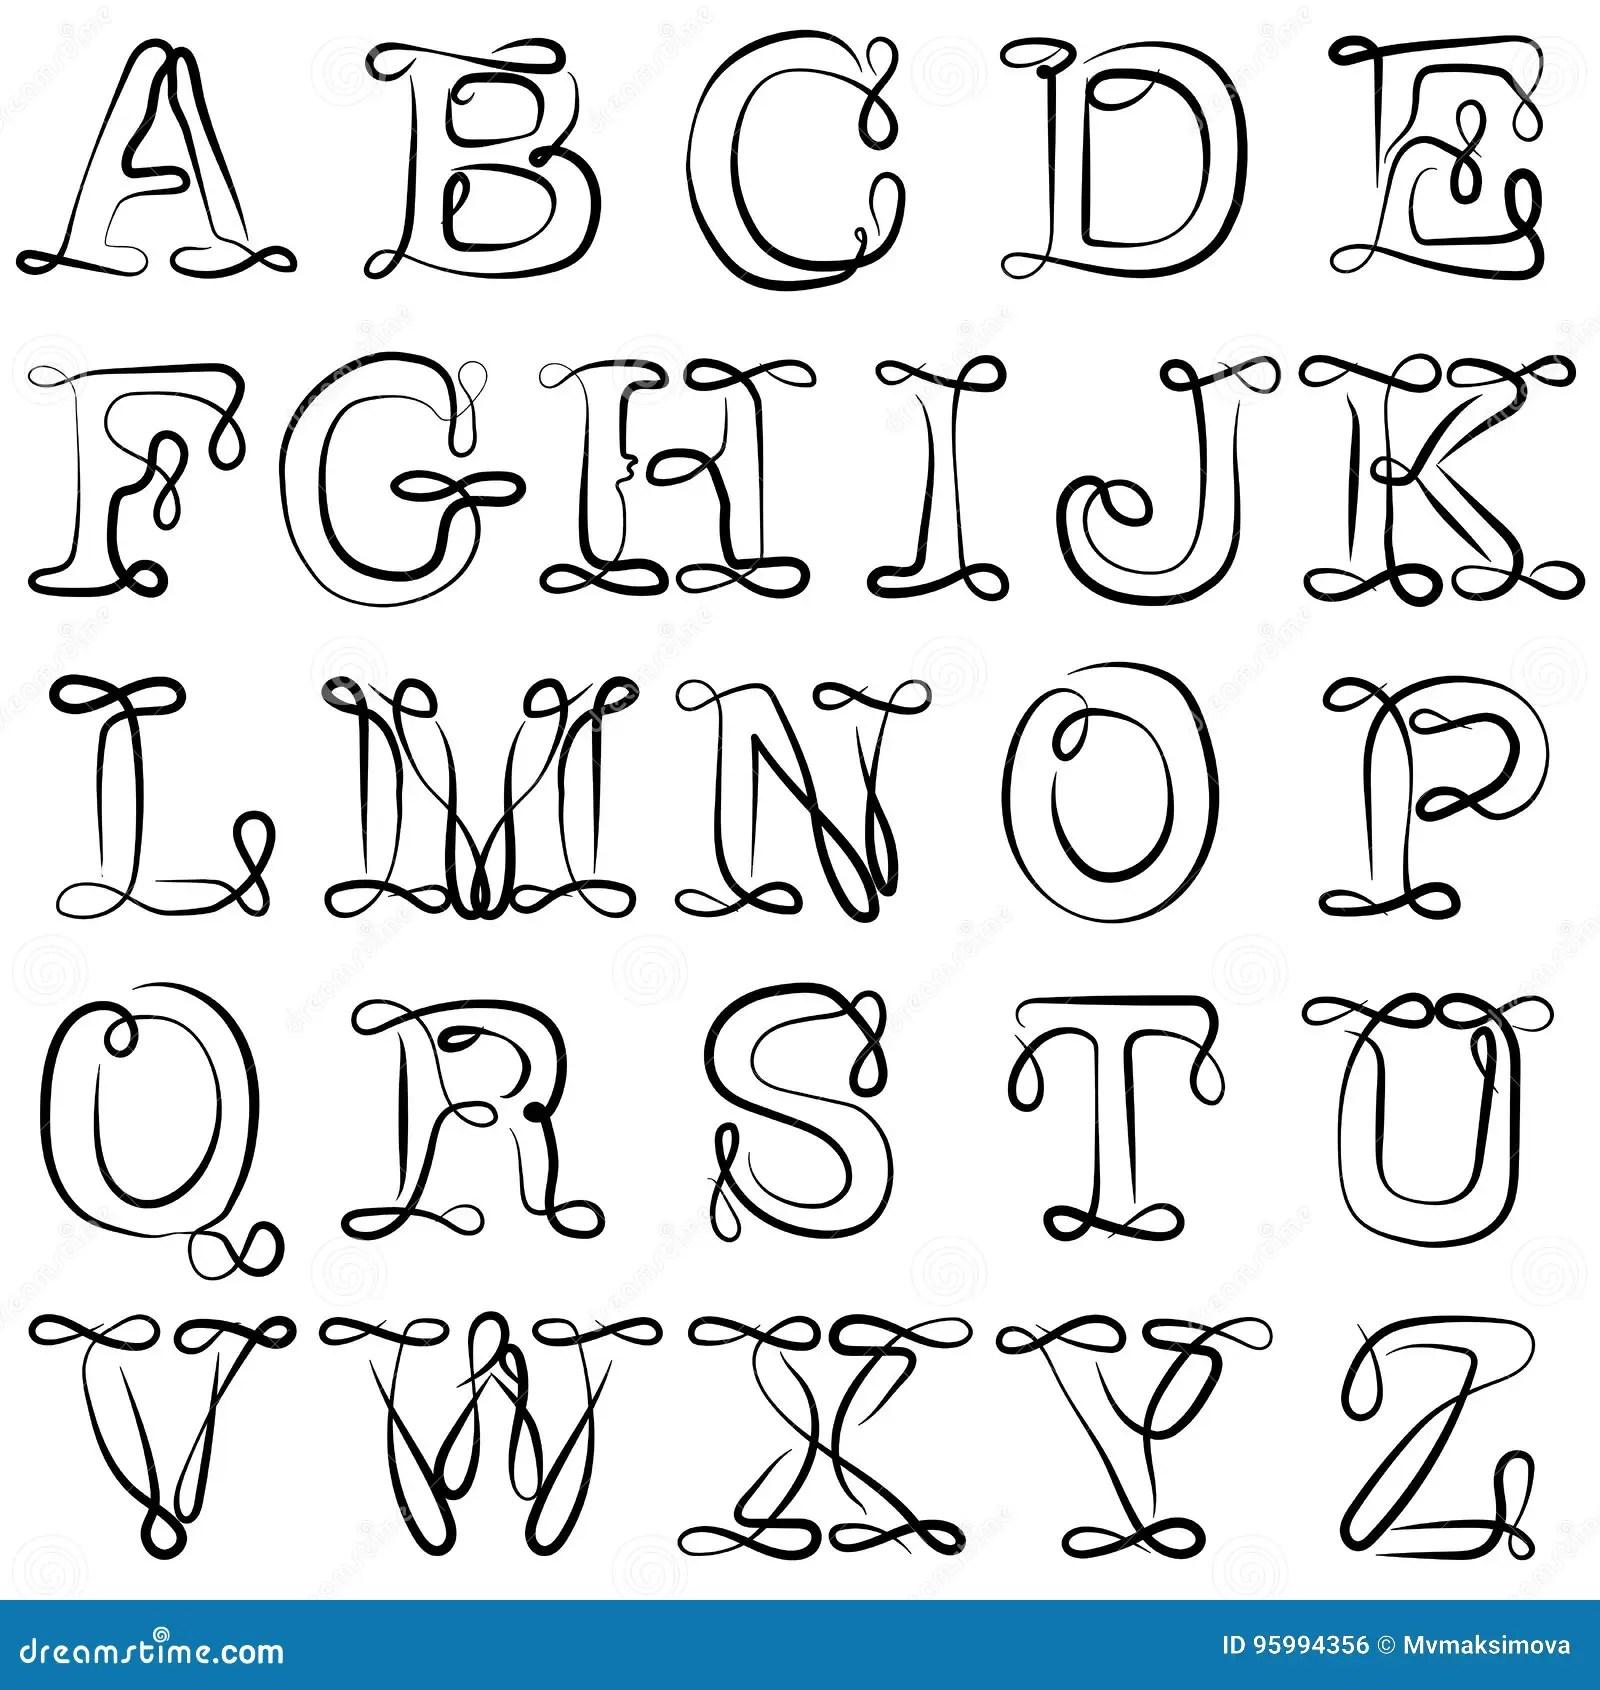 English Alphabet. ABC. English Letters Are Black On White